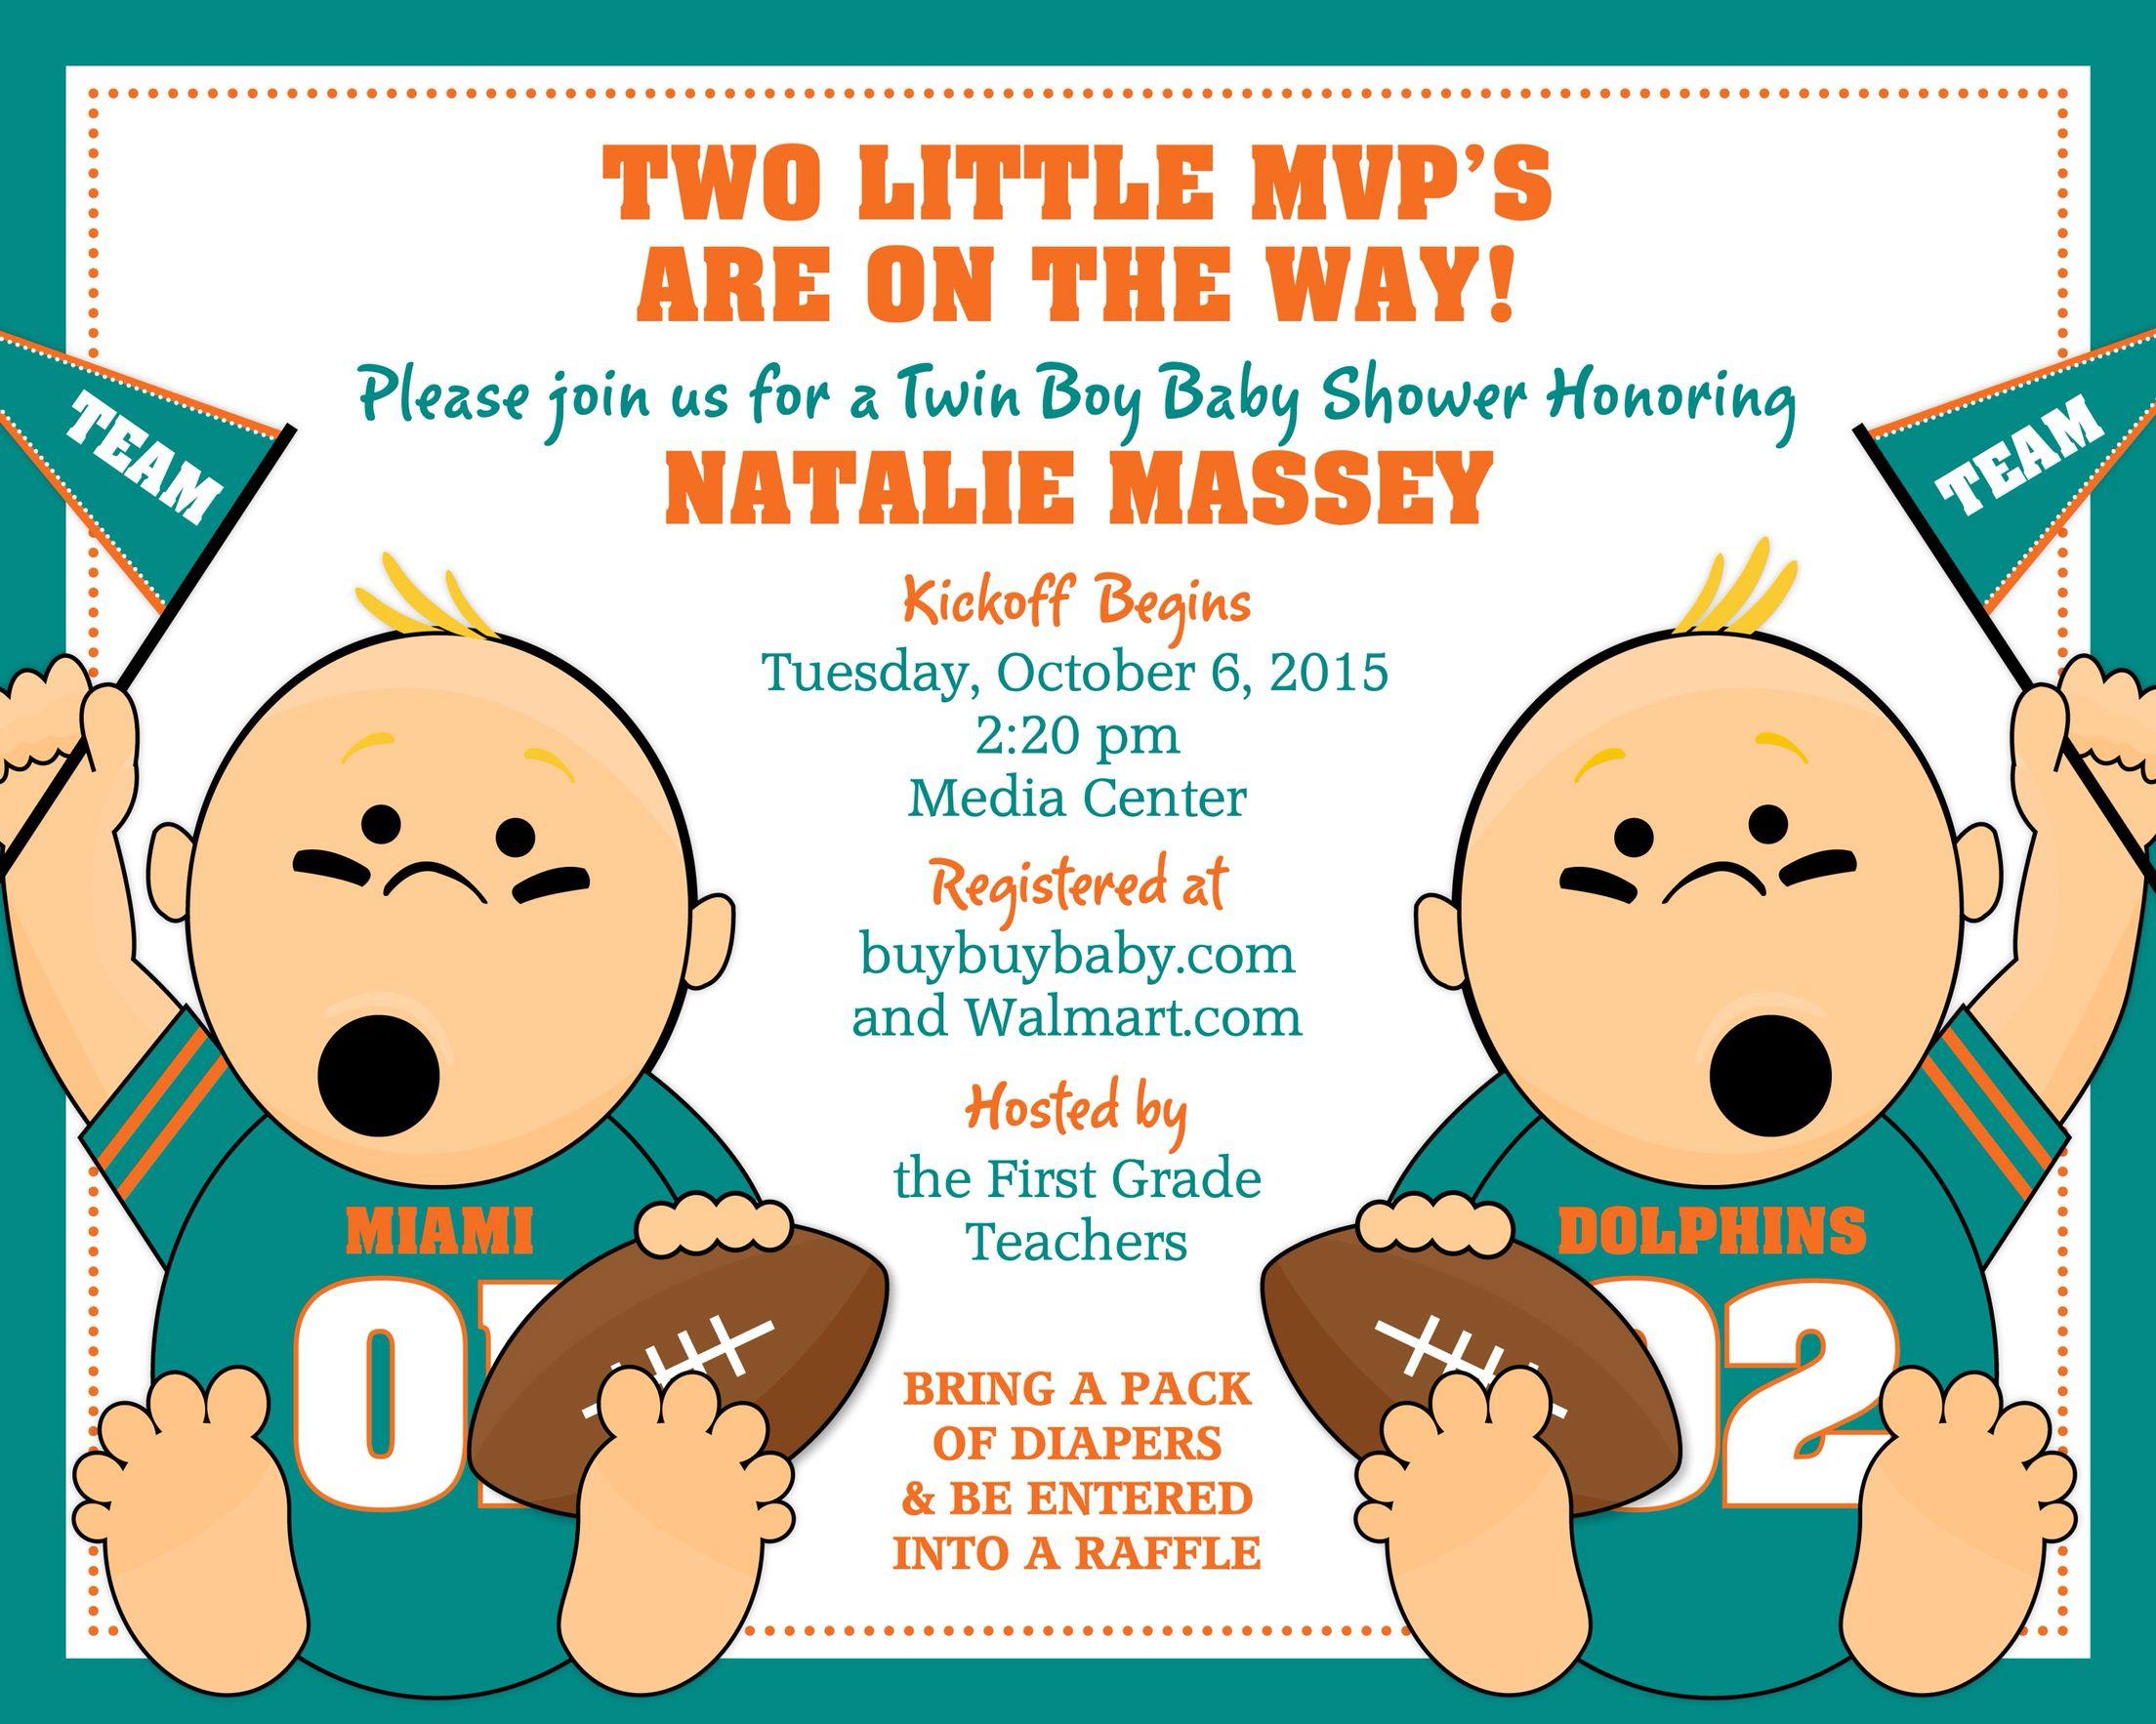 Twin boys baby shower invitation miami dolphins the twins twin boys baby shower invitation miami dolphins filmwisefo